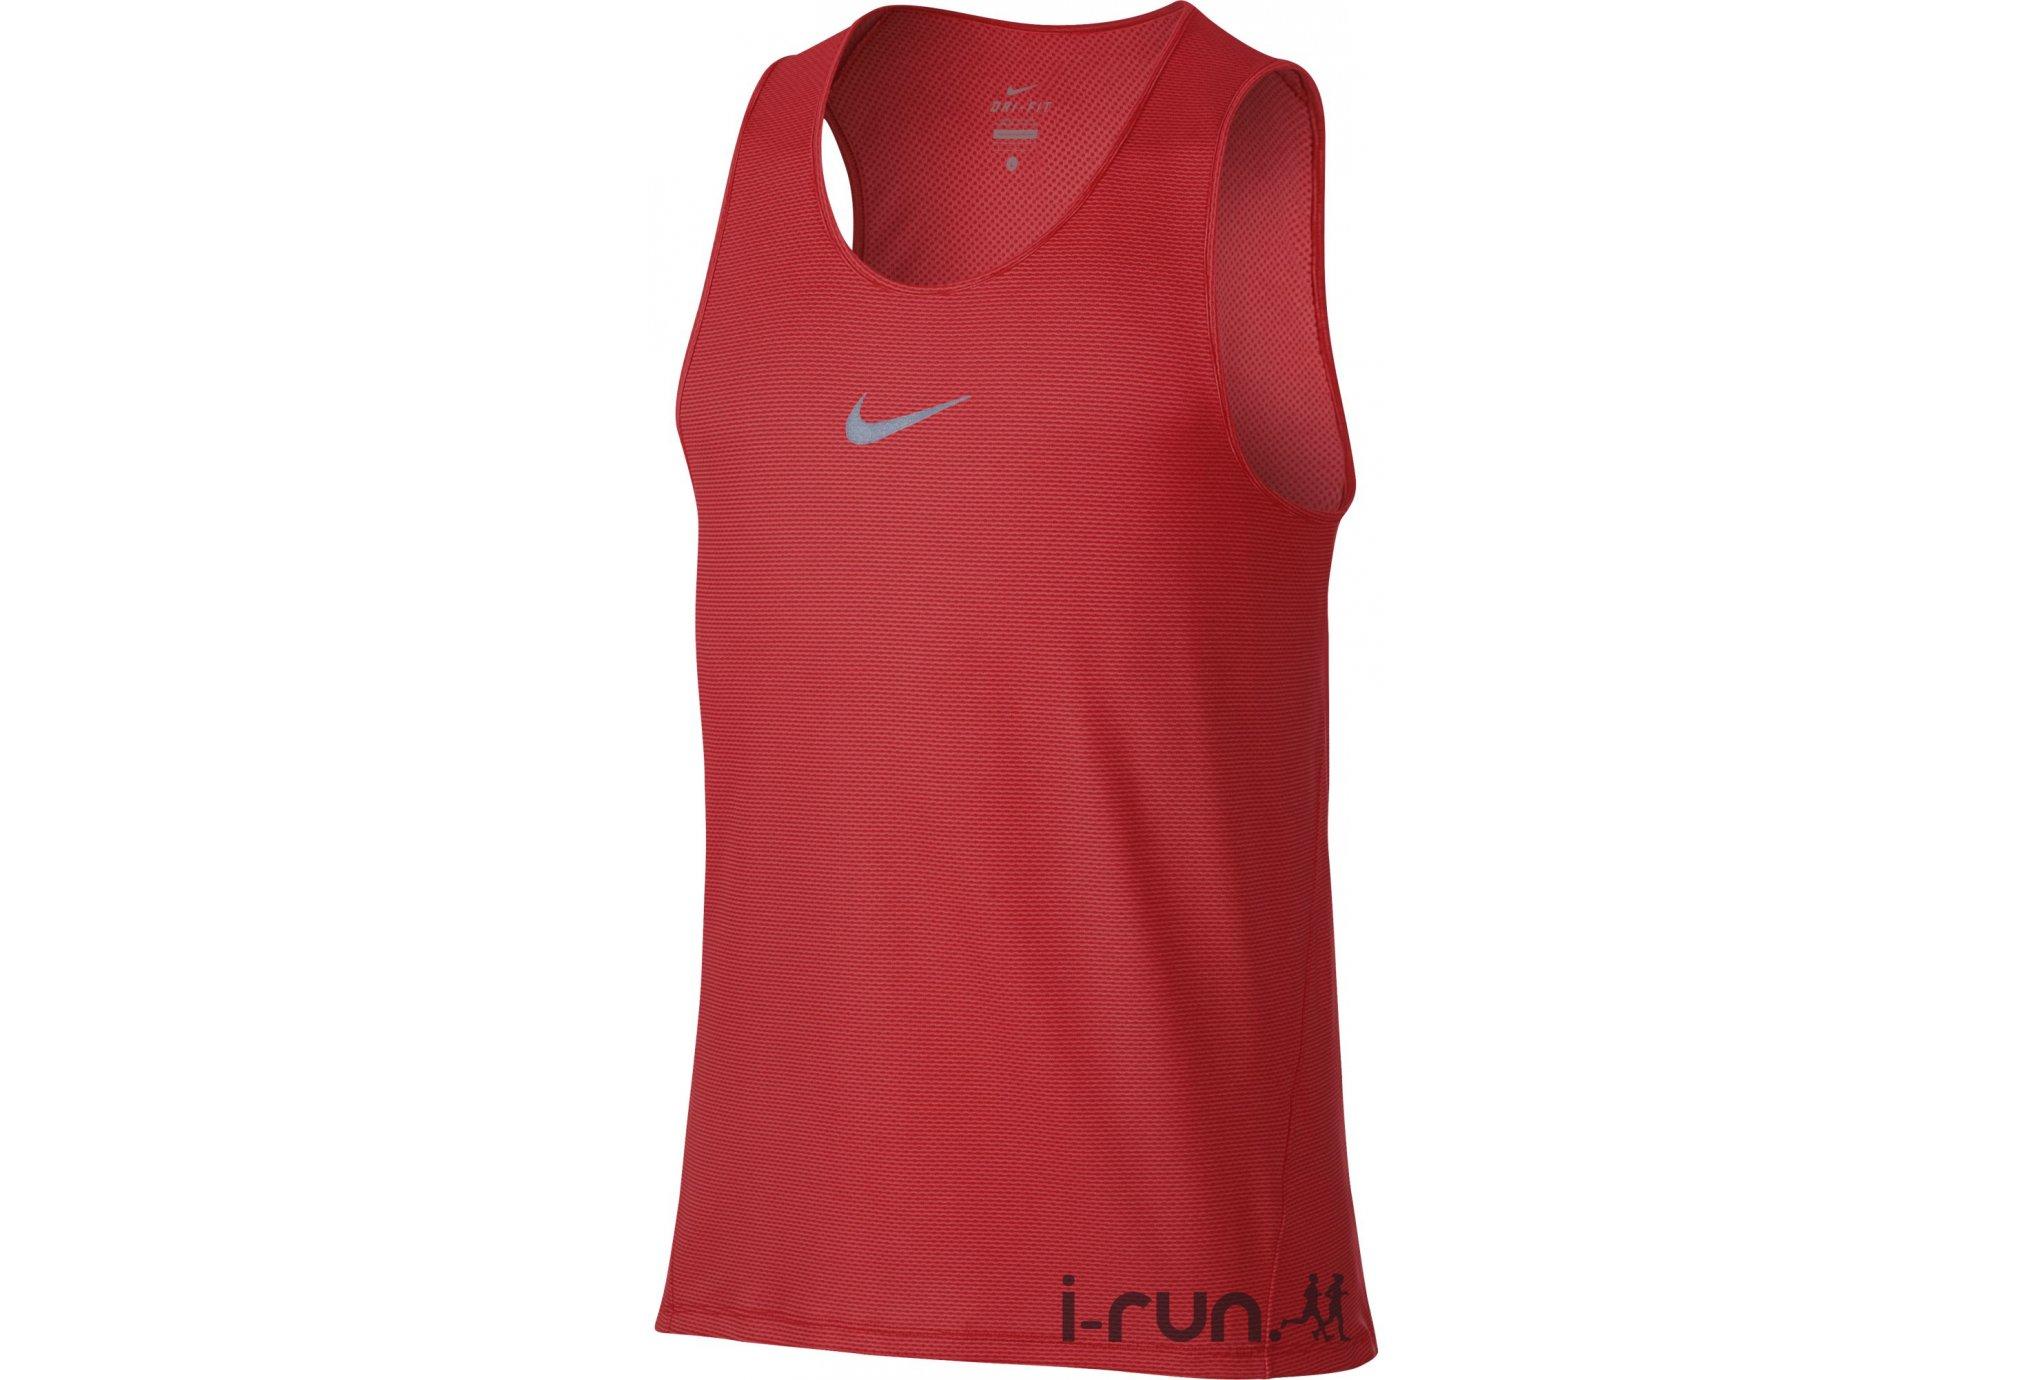 Nike d bardeur aeroreact m pas cher destockage nike running d bardeur aeror - Avis destockage fitness ...